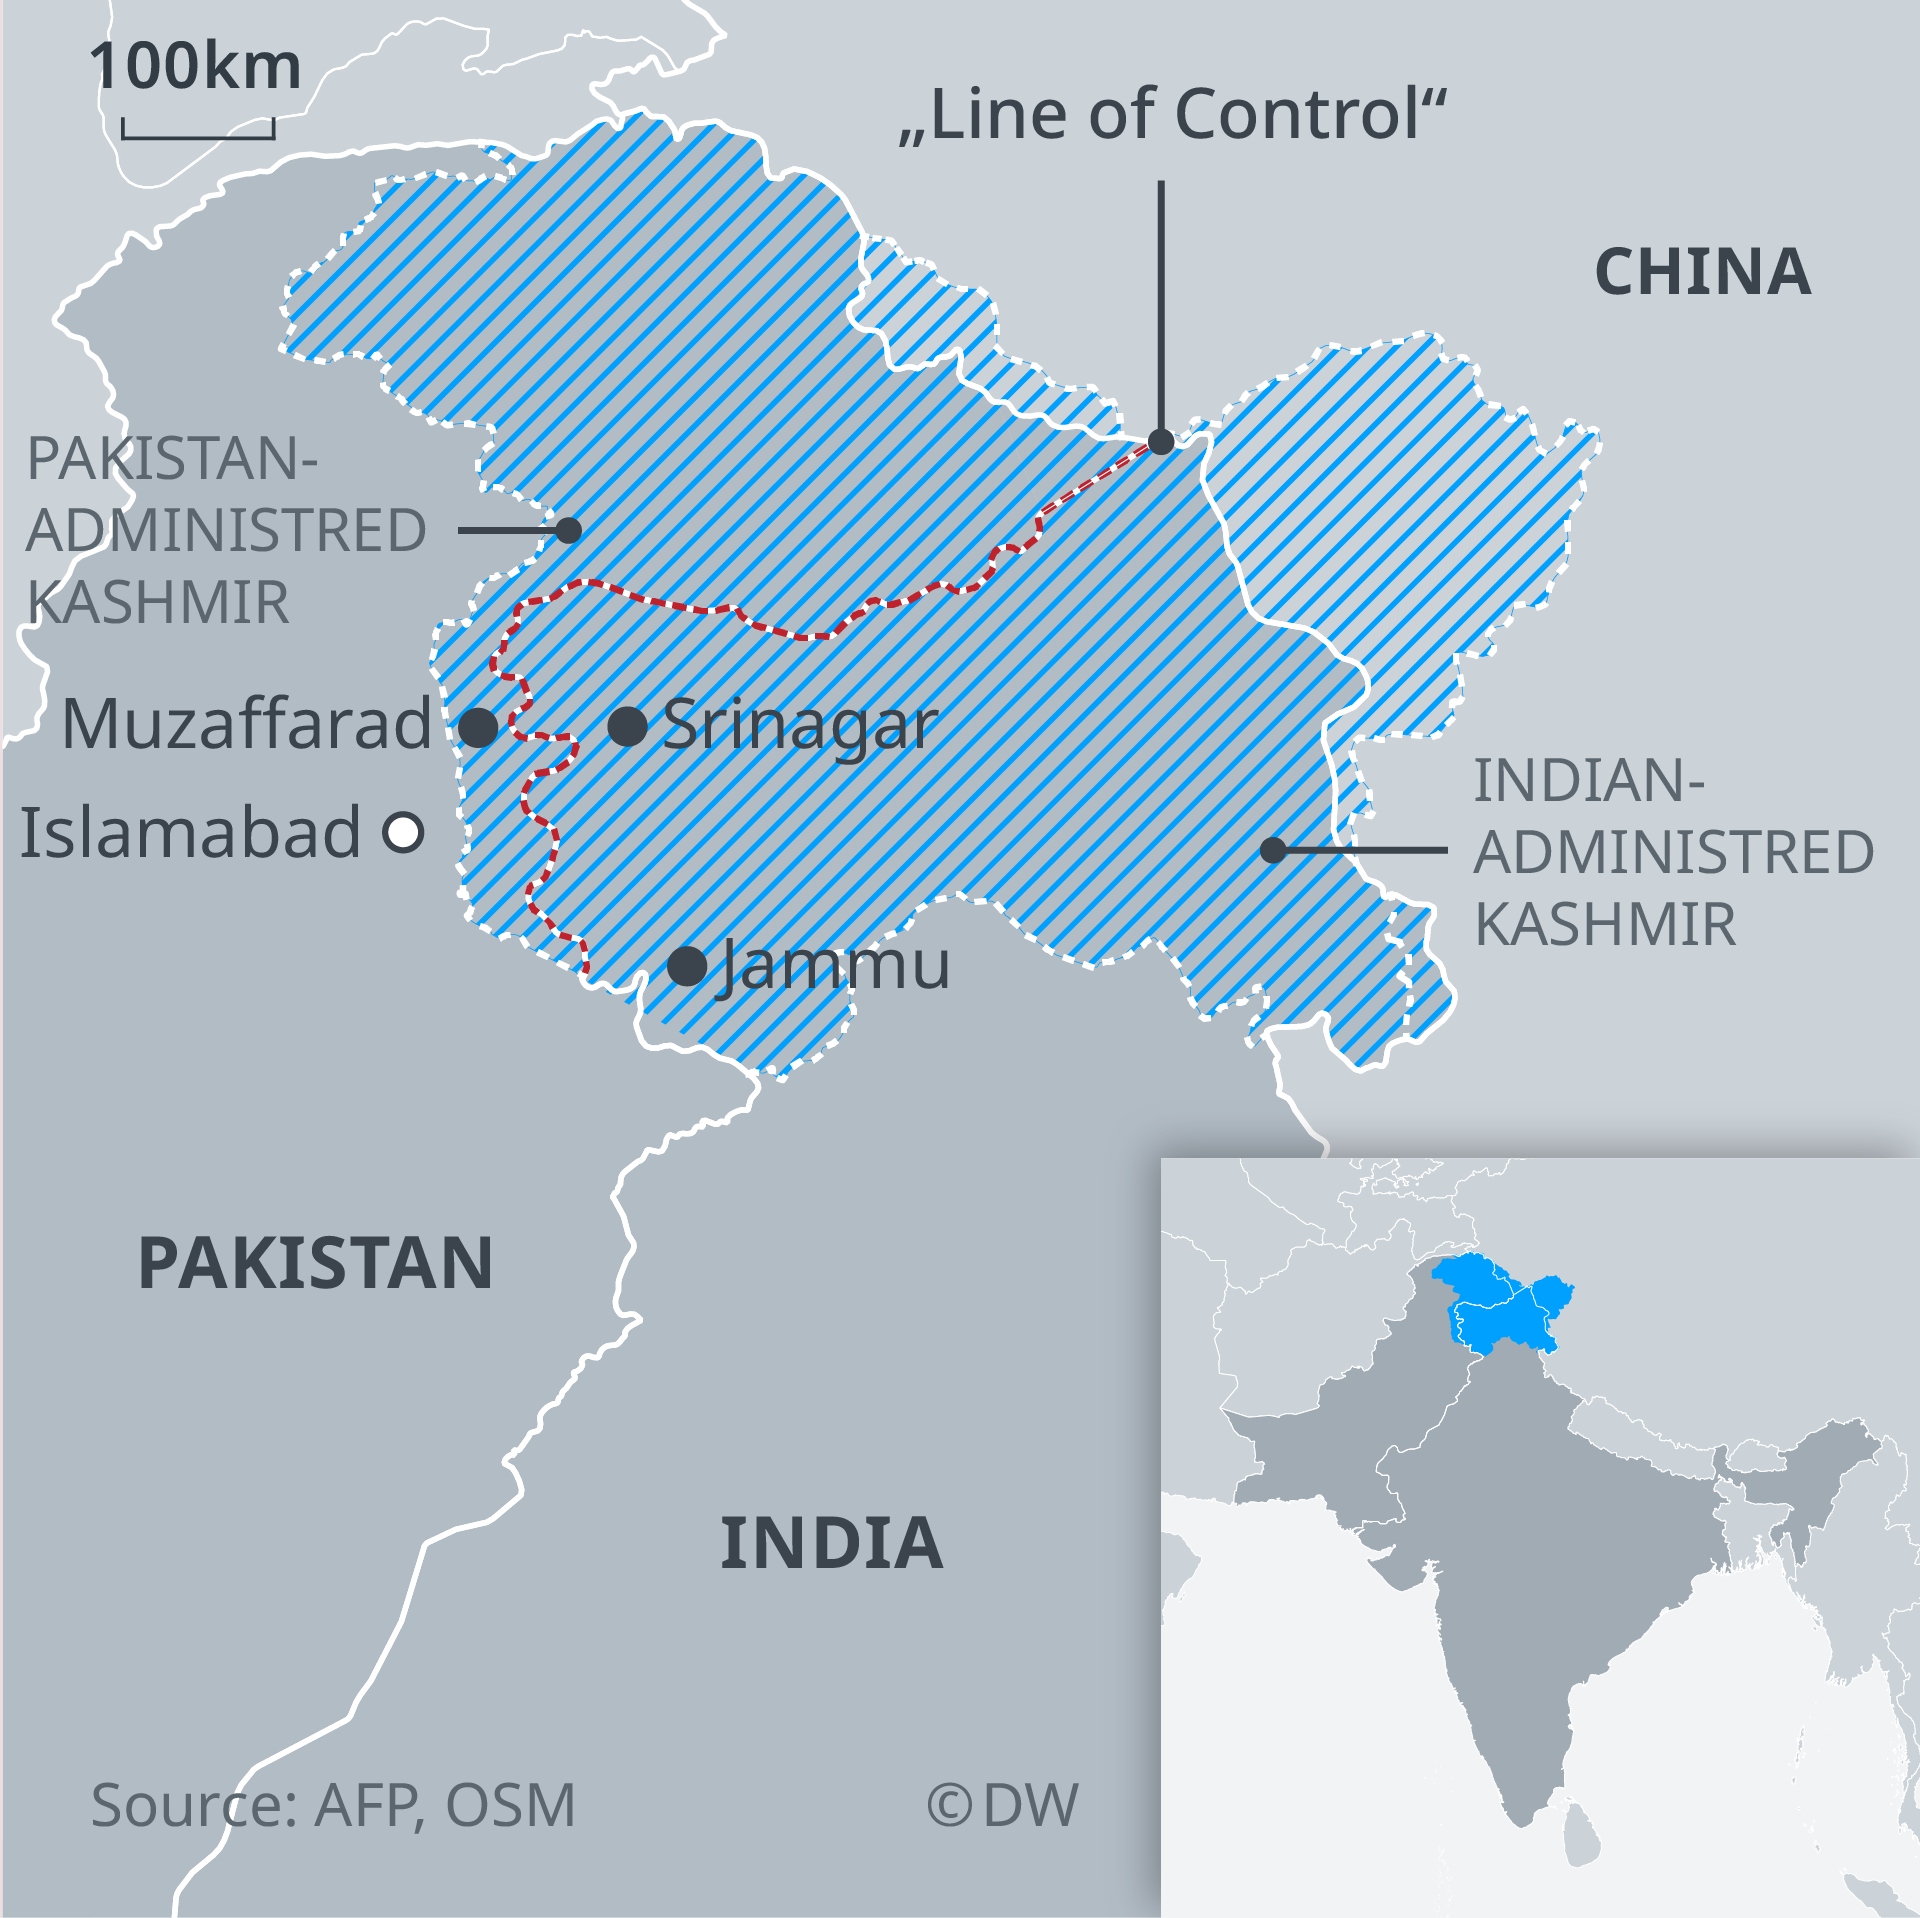 A map of disputed Kashmir region